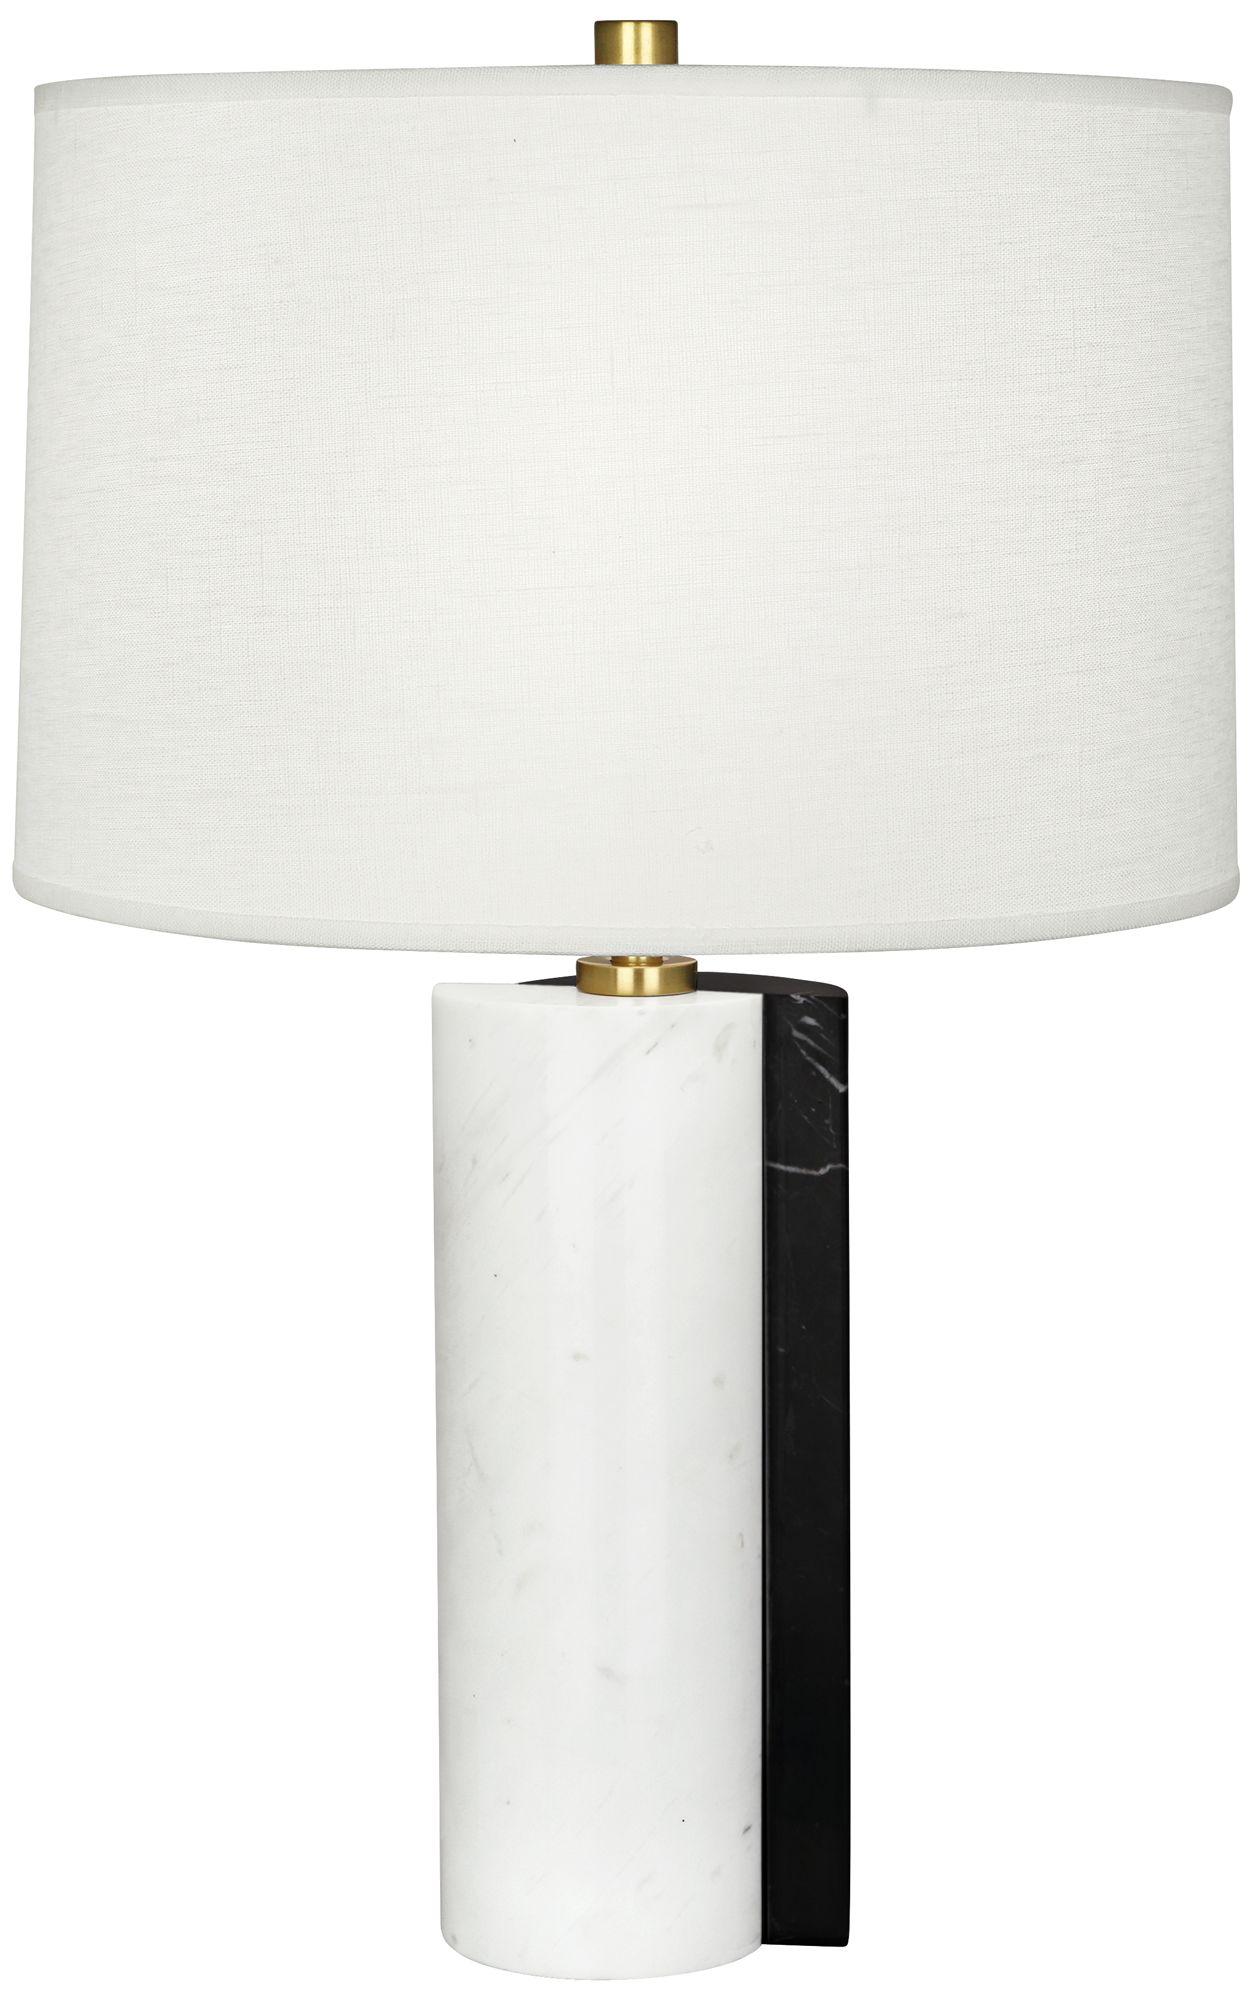 Jonathan Adler Canaan Oyster Dual Marble Table Lamp